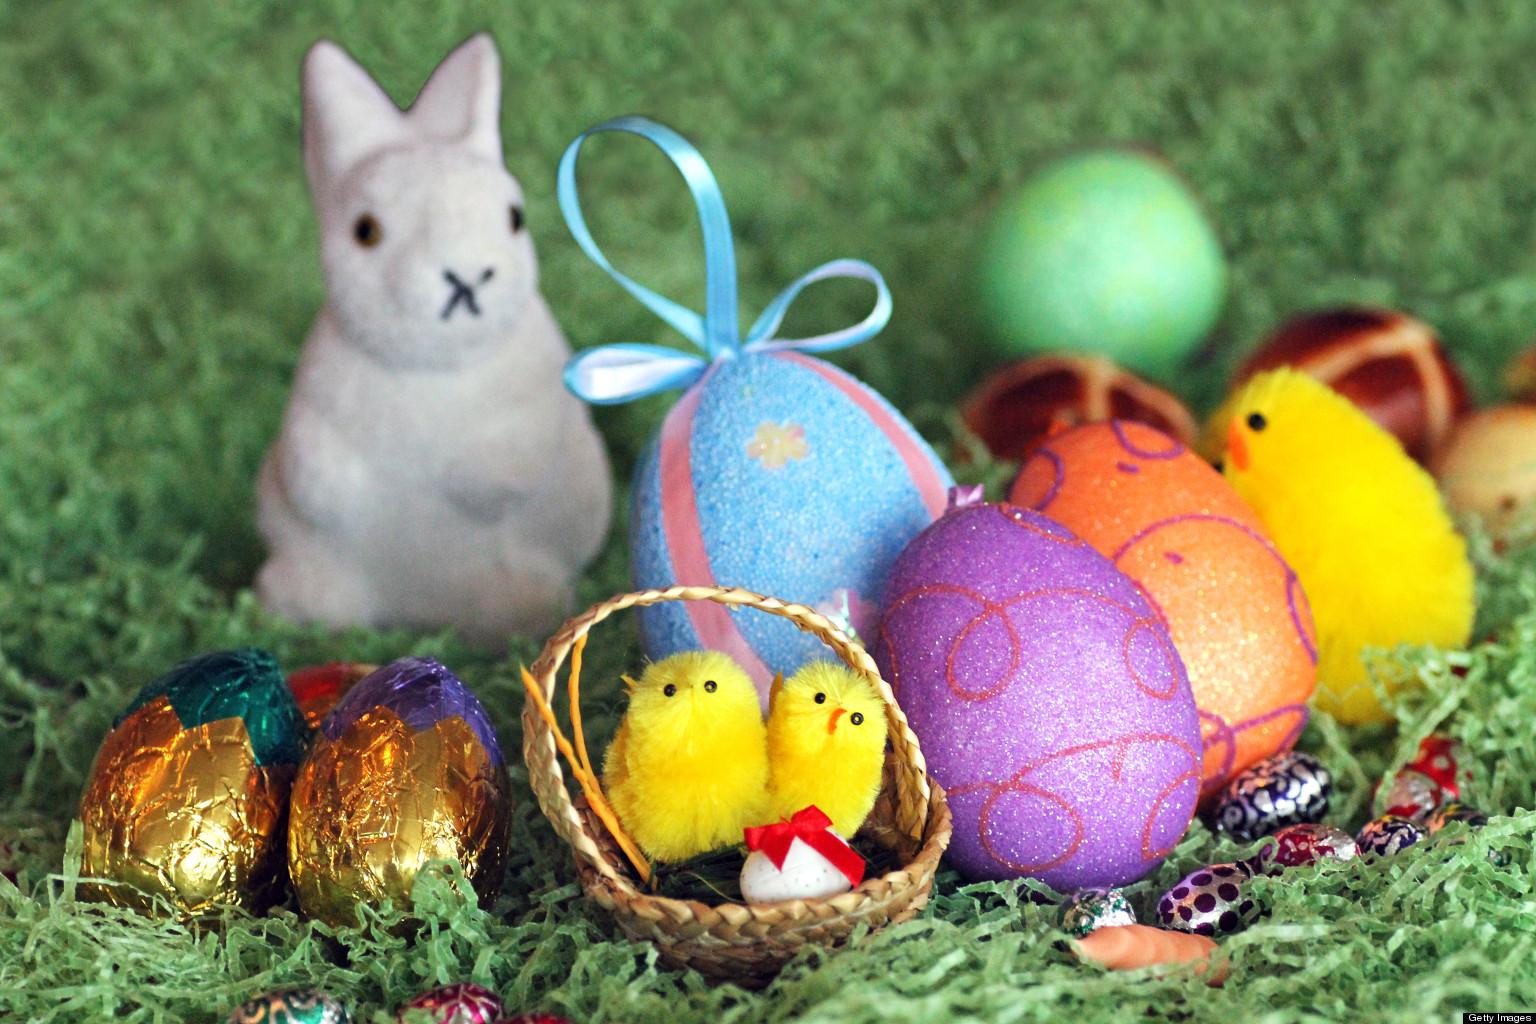 20 Easter Jokes For All The Family | The Huffington Post